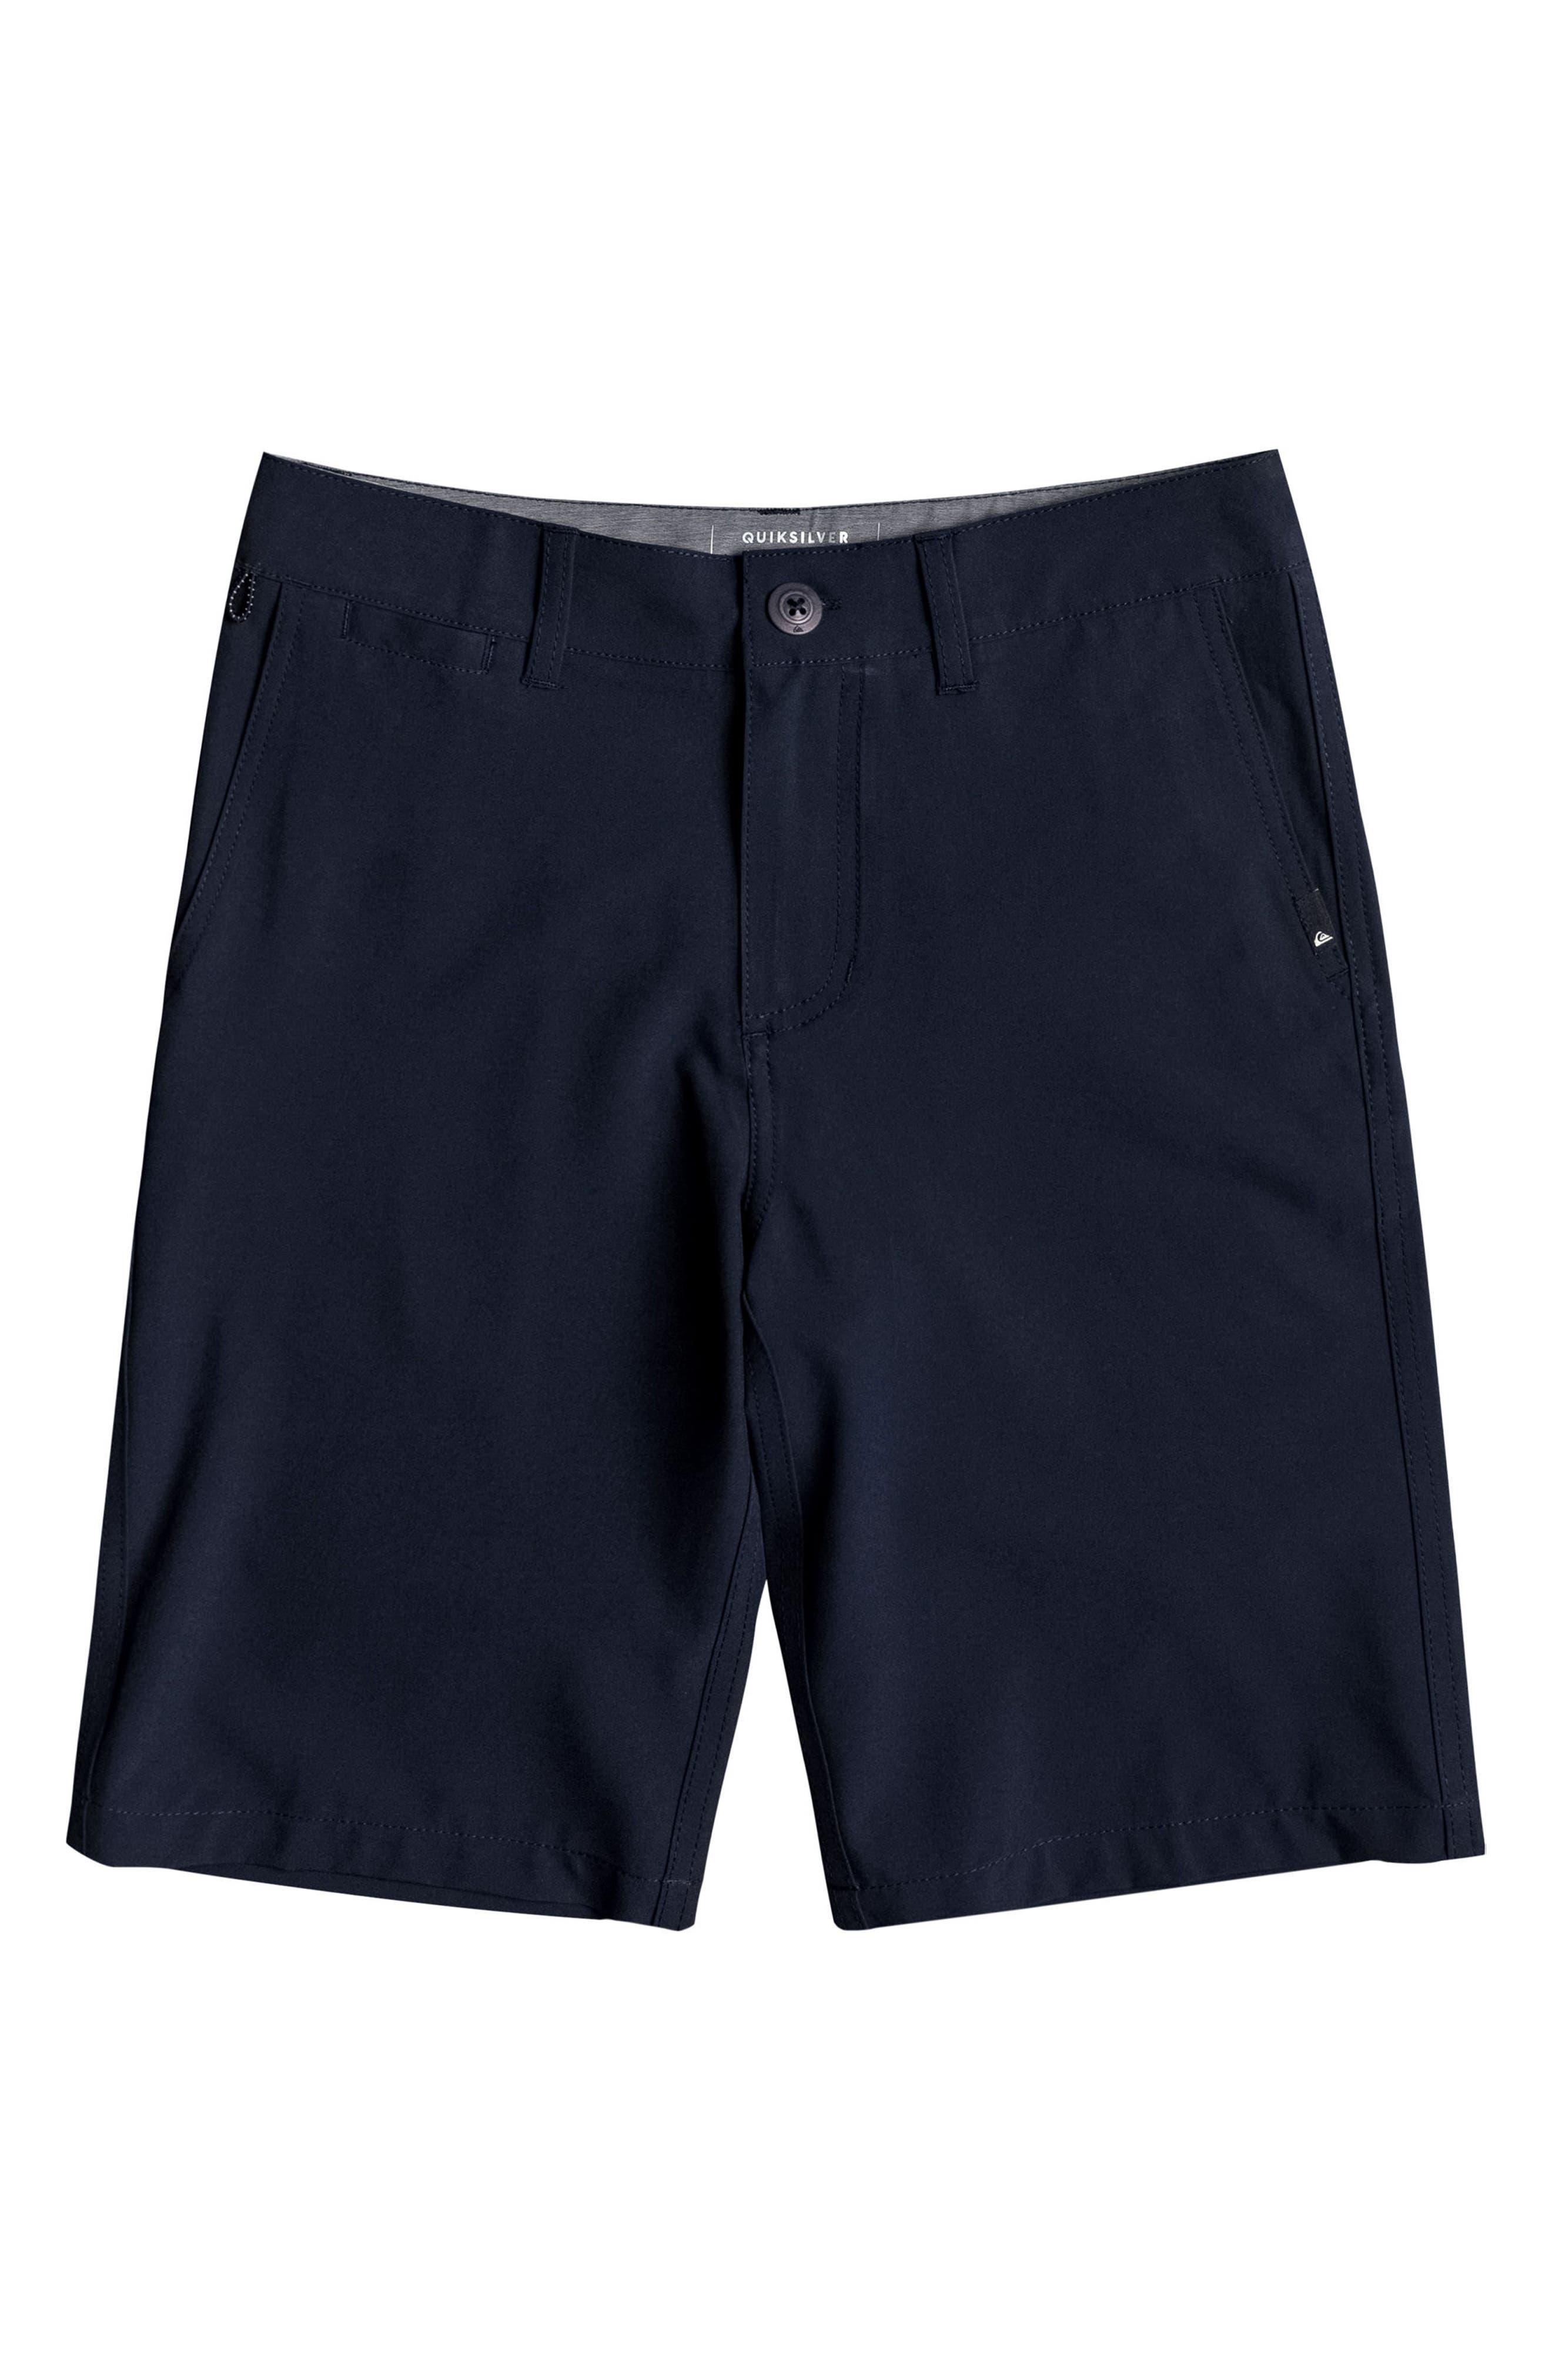 Union Amphibian Board Shorts,                             Main thumbnail 4, color,